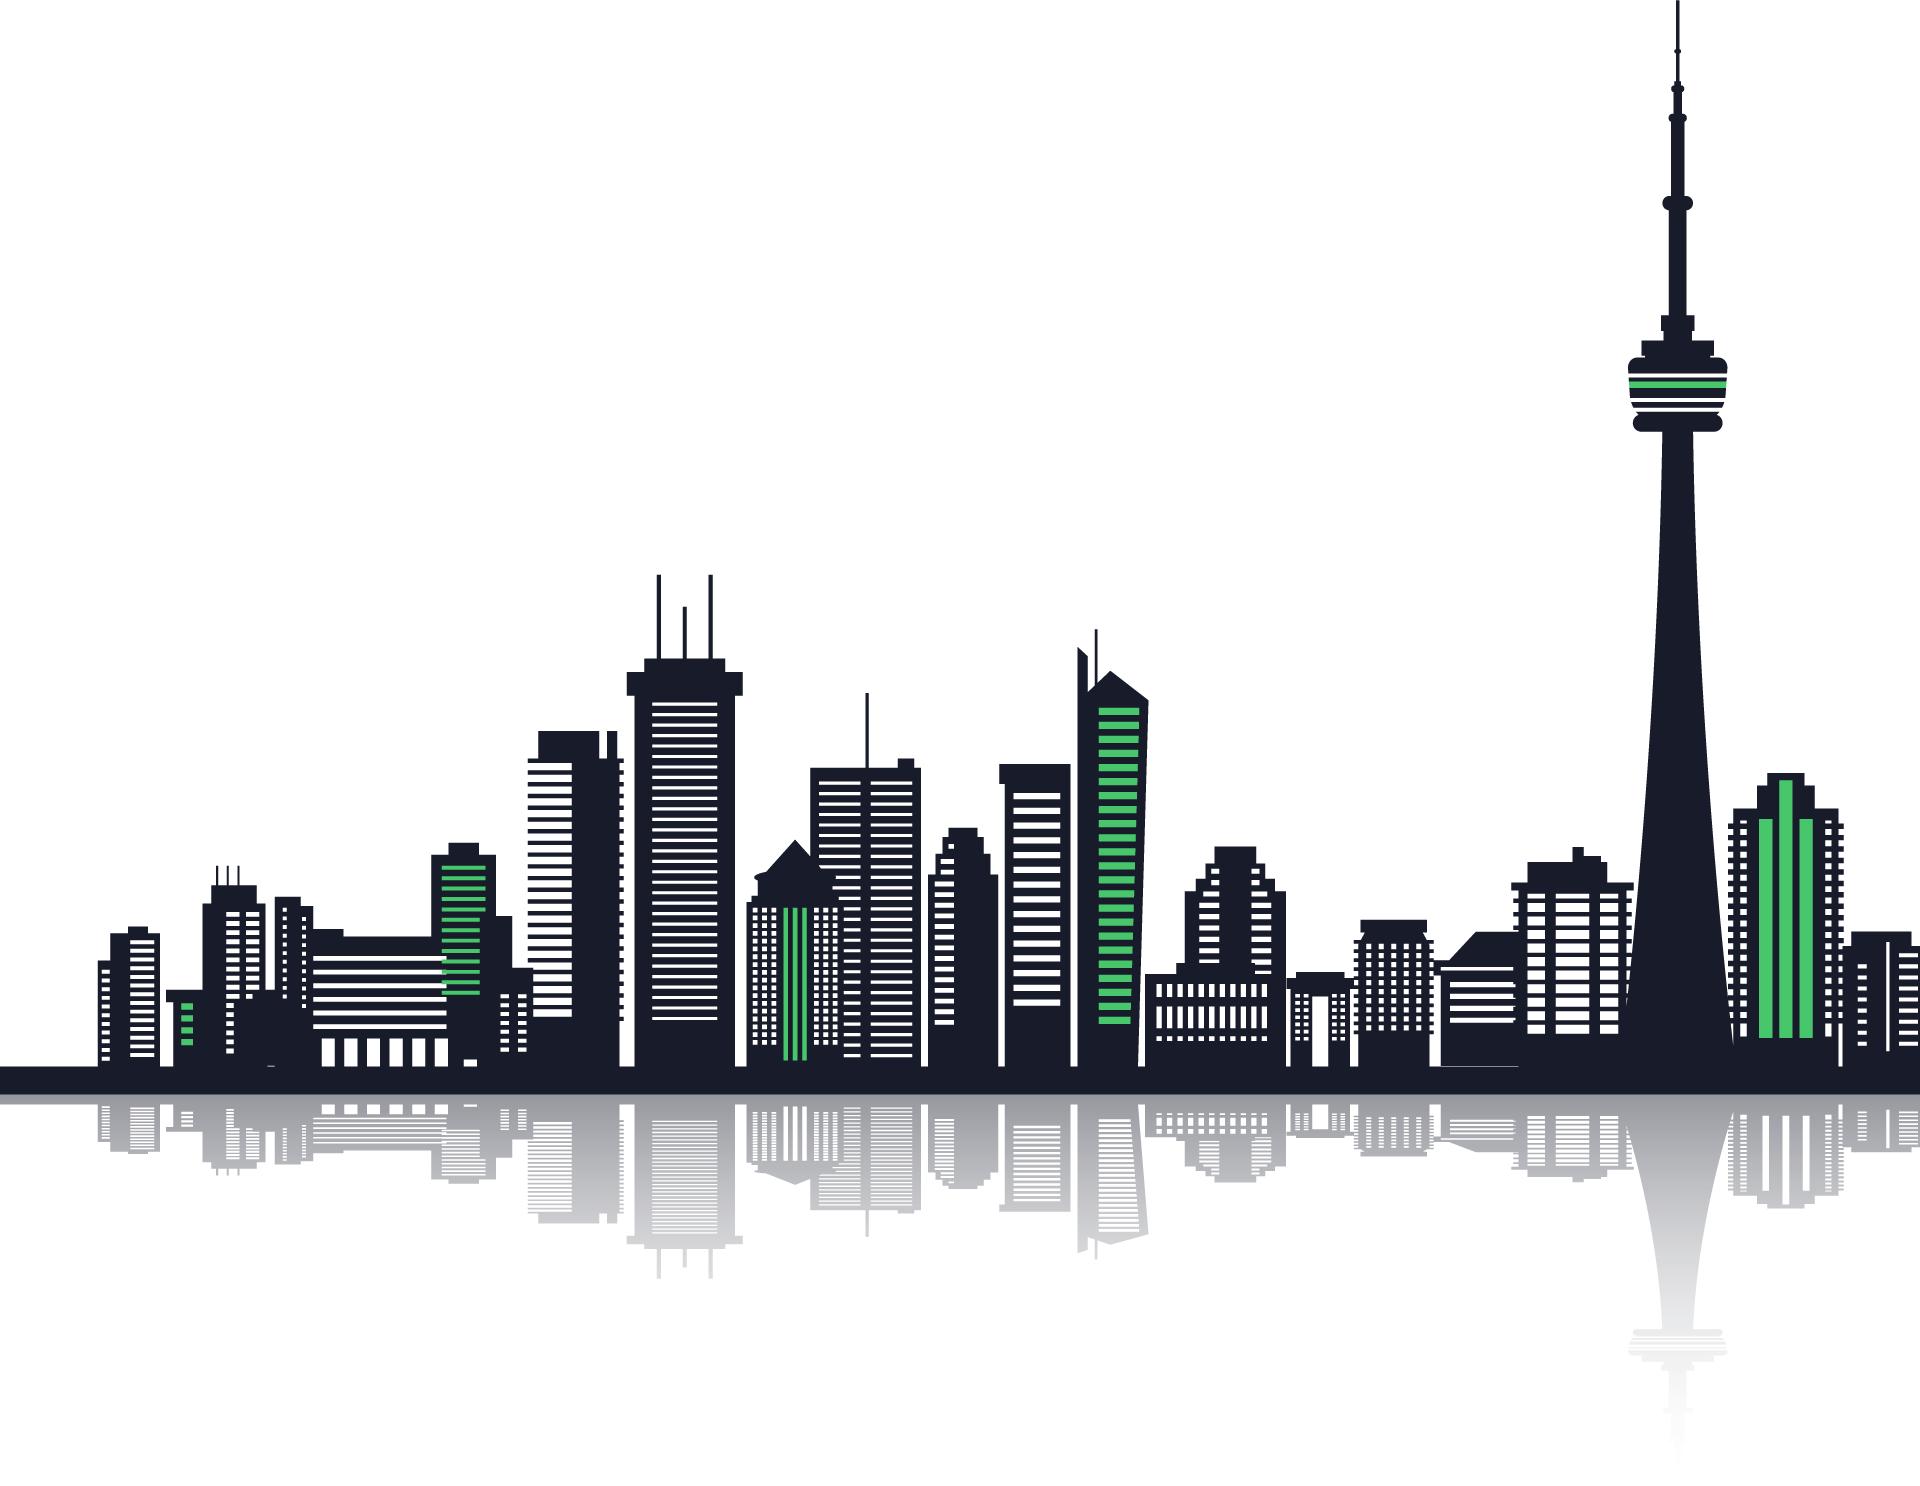 Toronto Waxing Sugaring